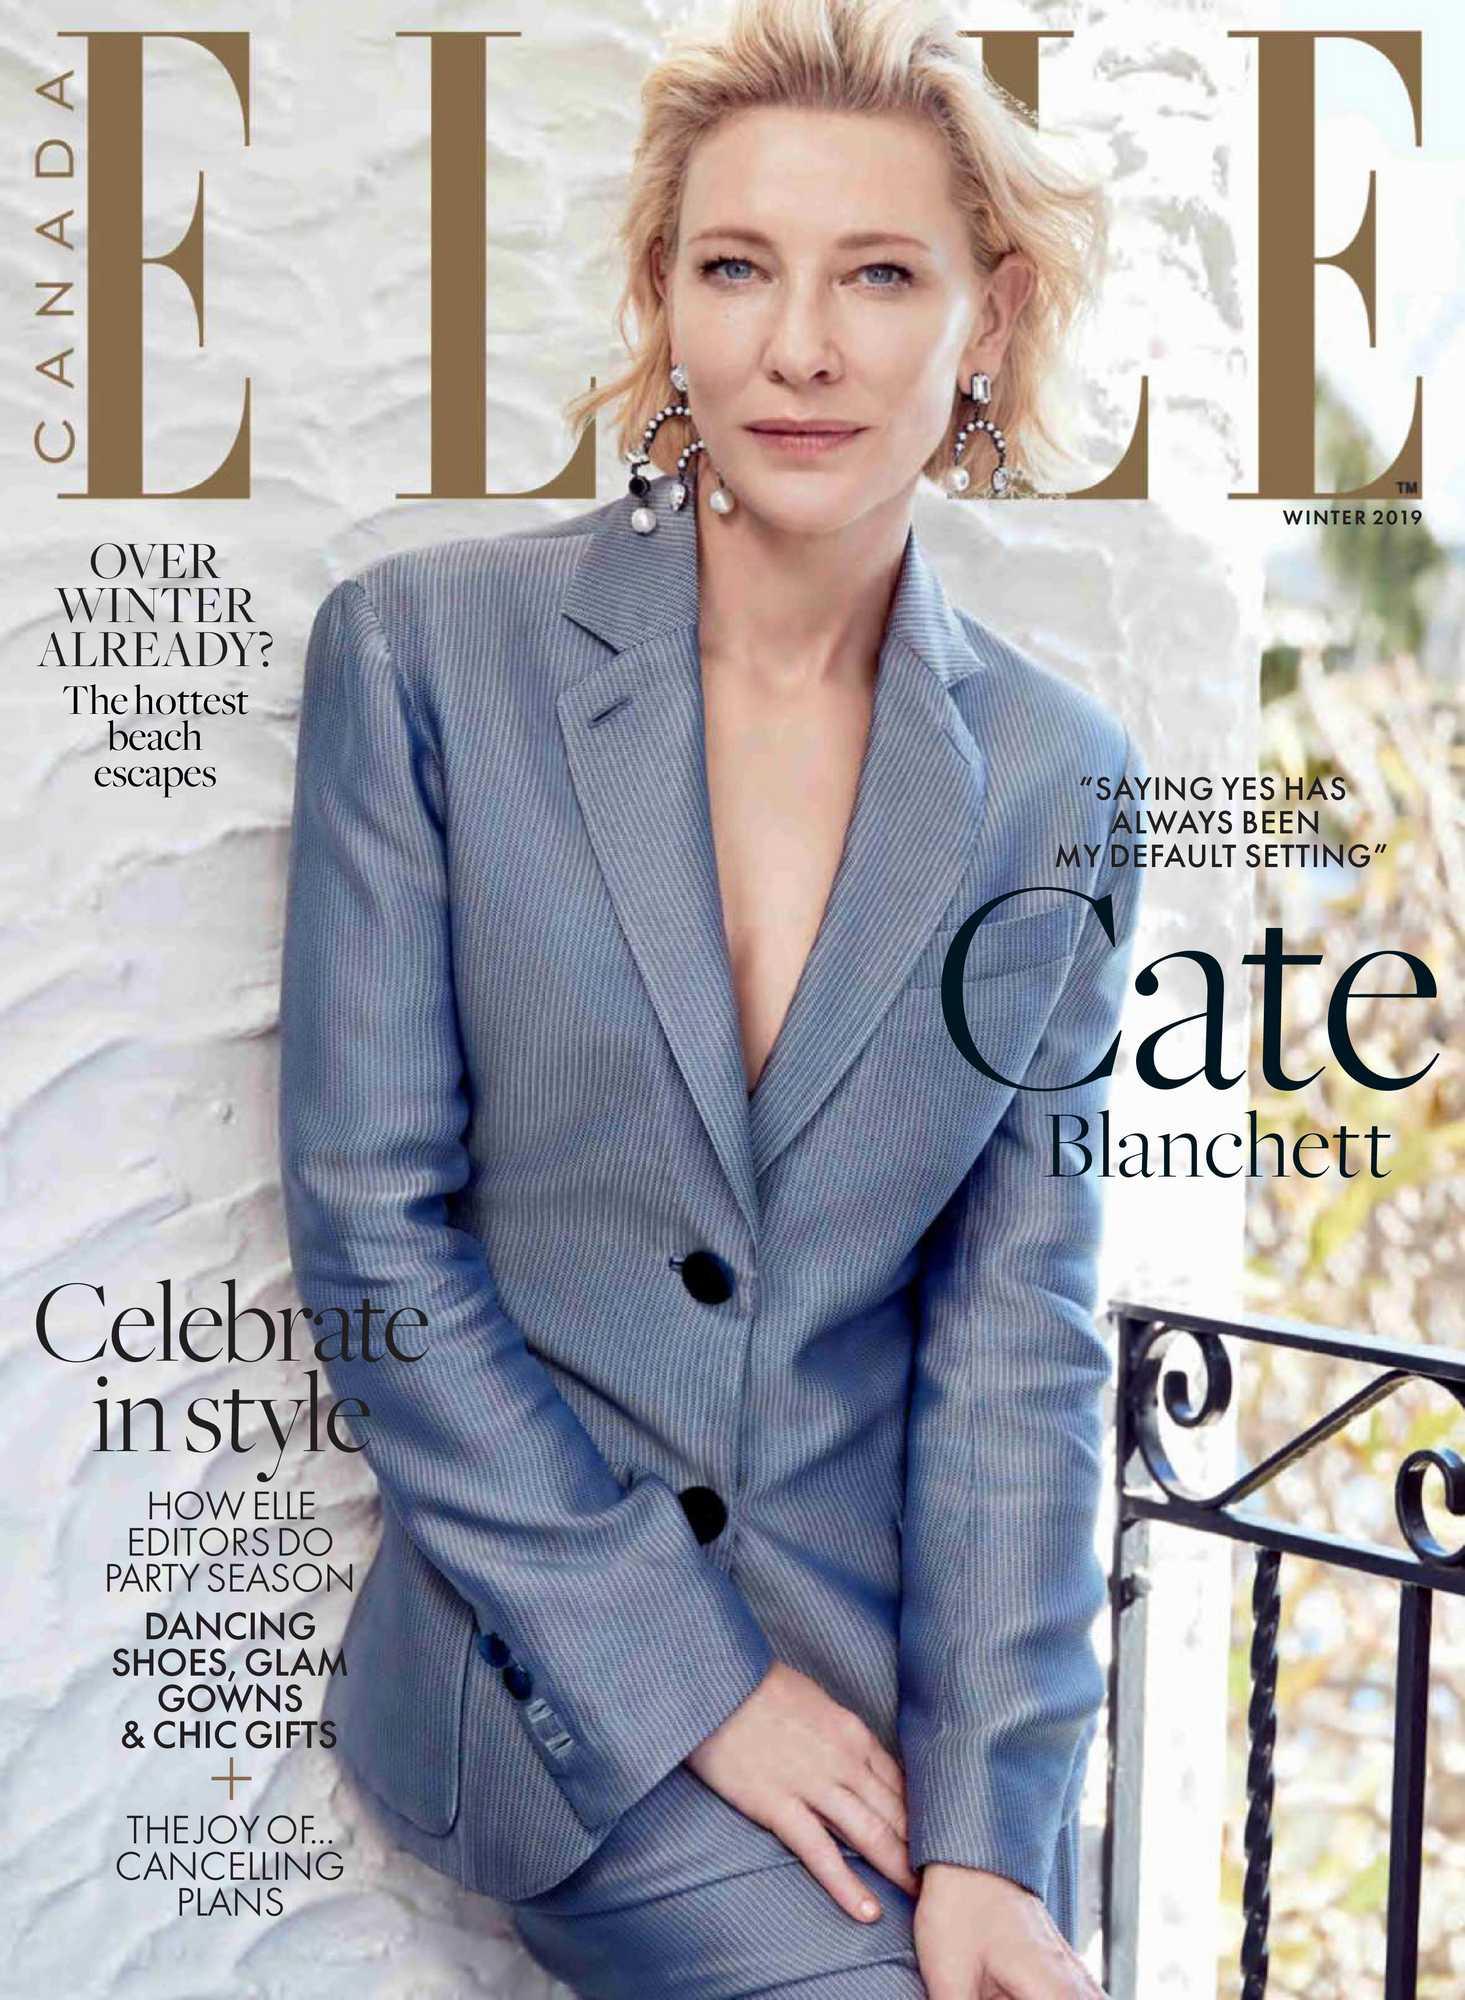 Cate-Blanchett-Elle-Canada-December-201812a7321024005774.jpg